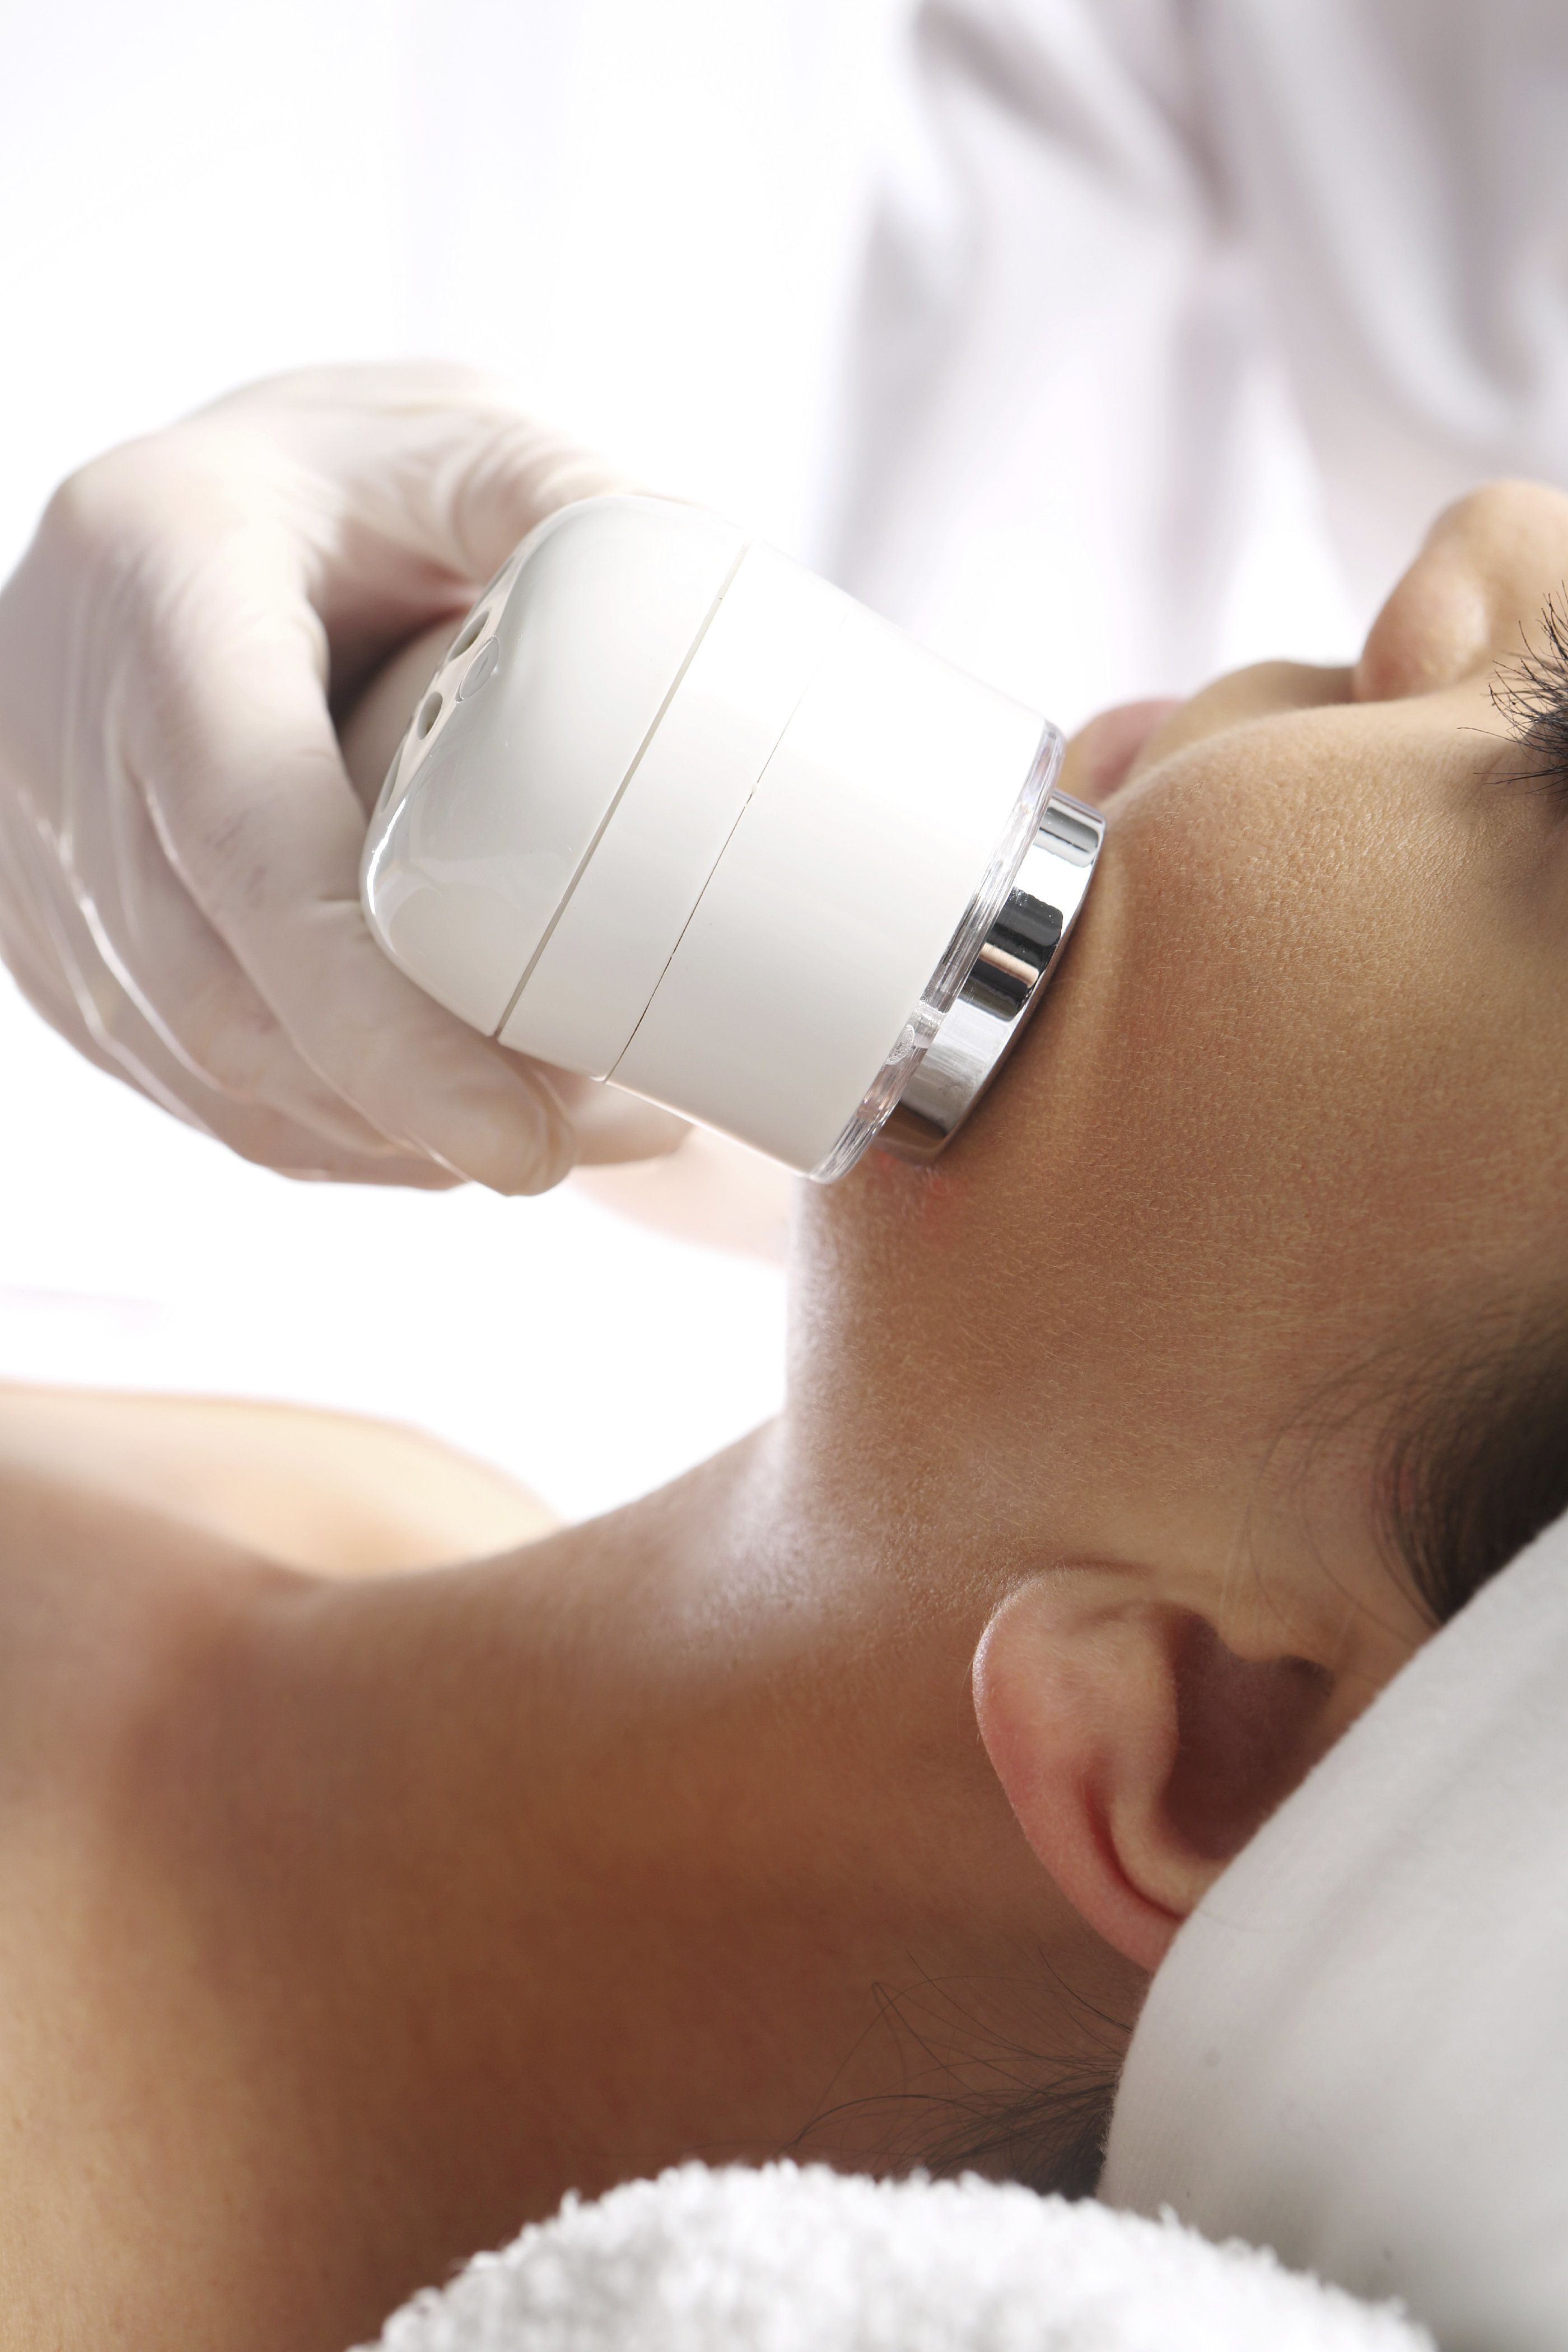 Laser skin care treatment